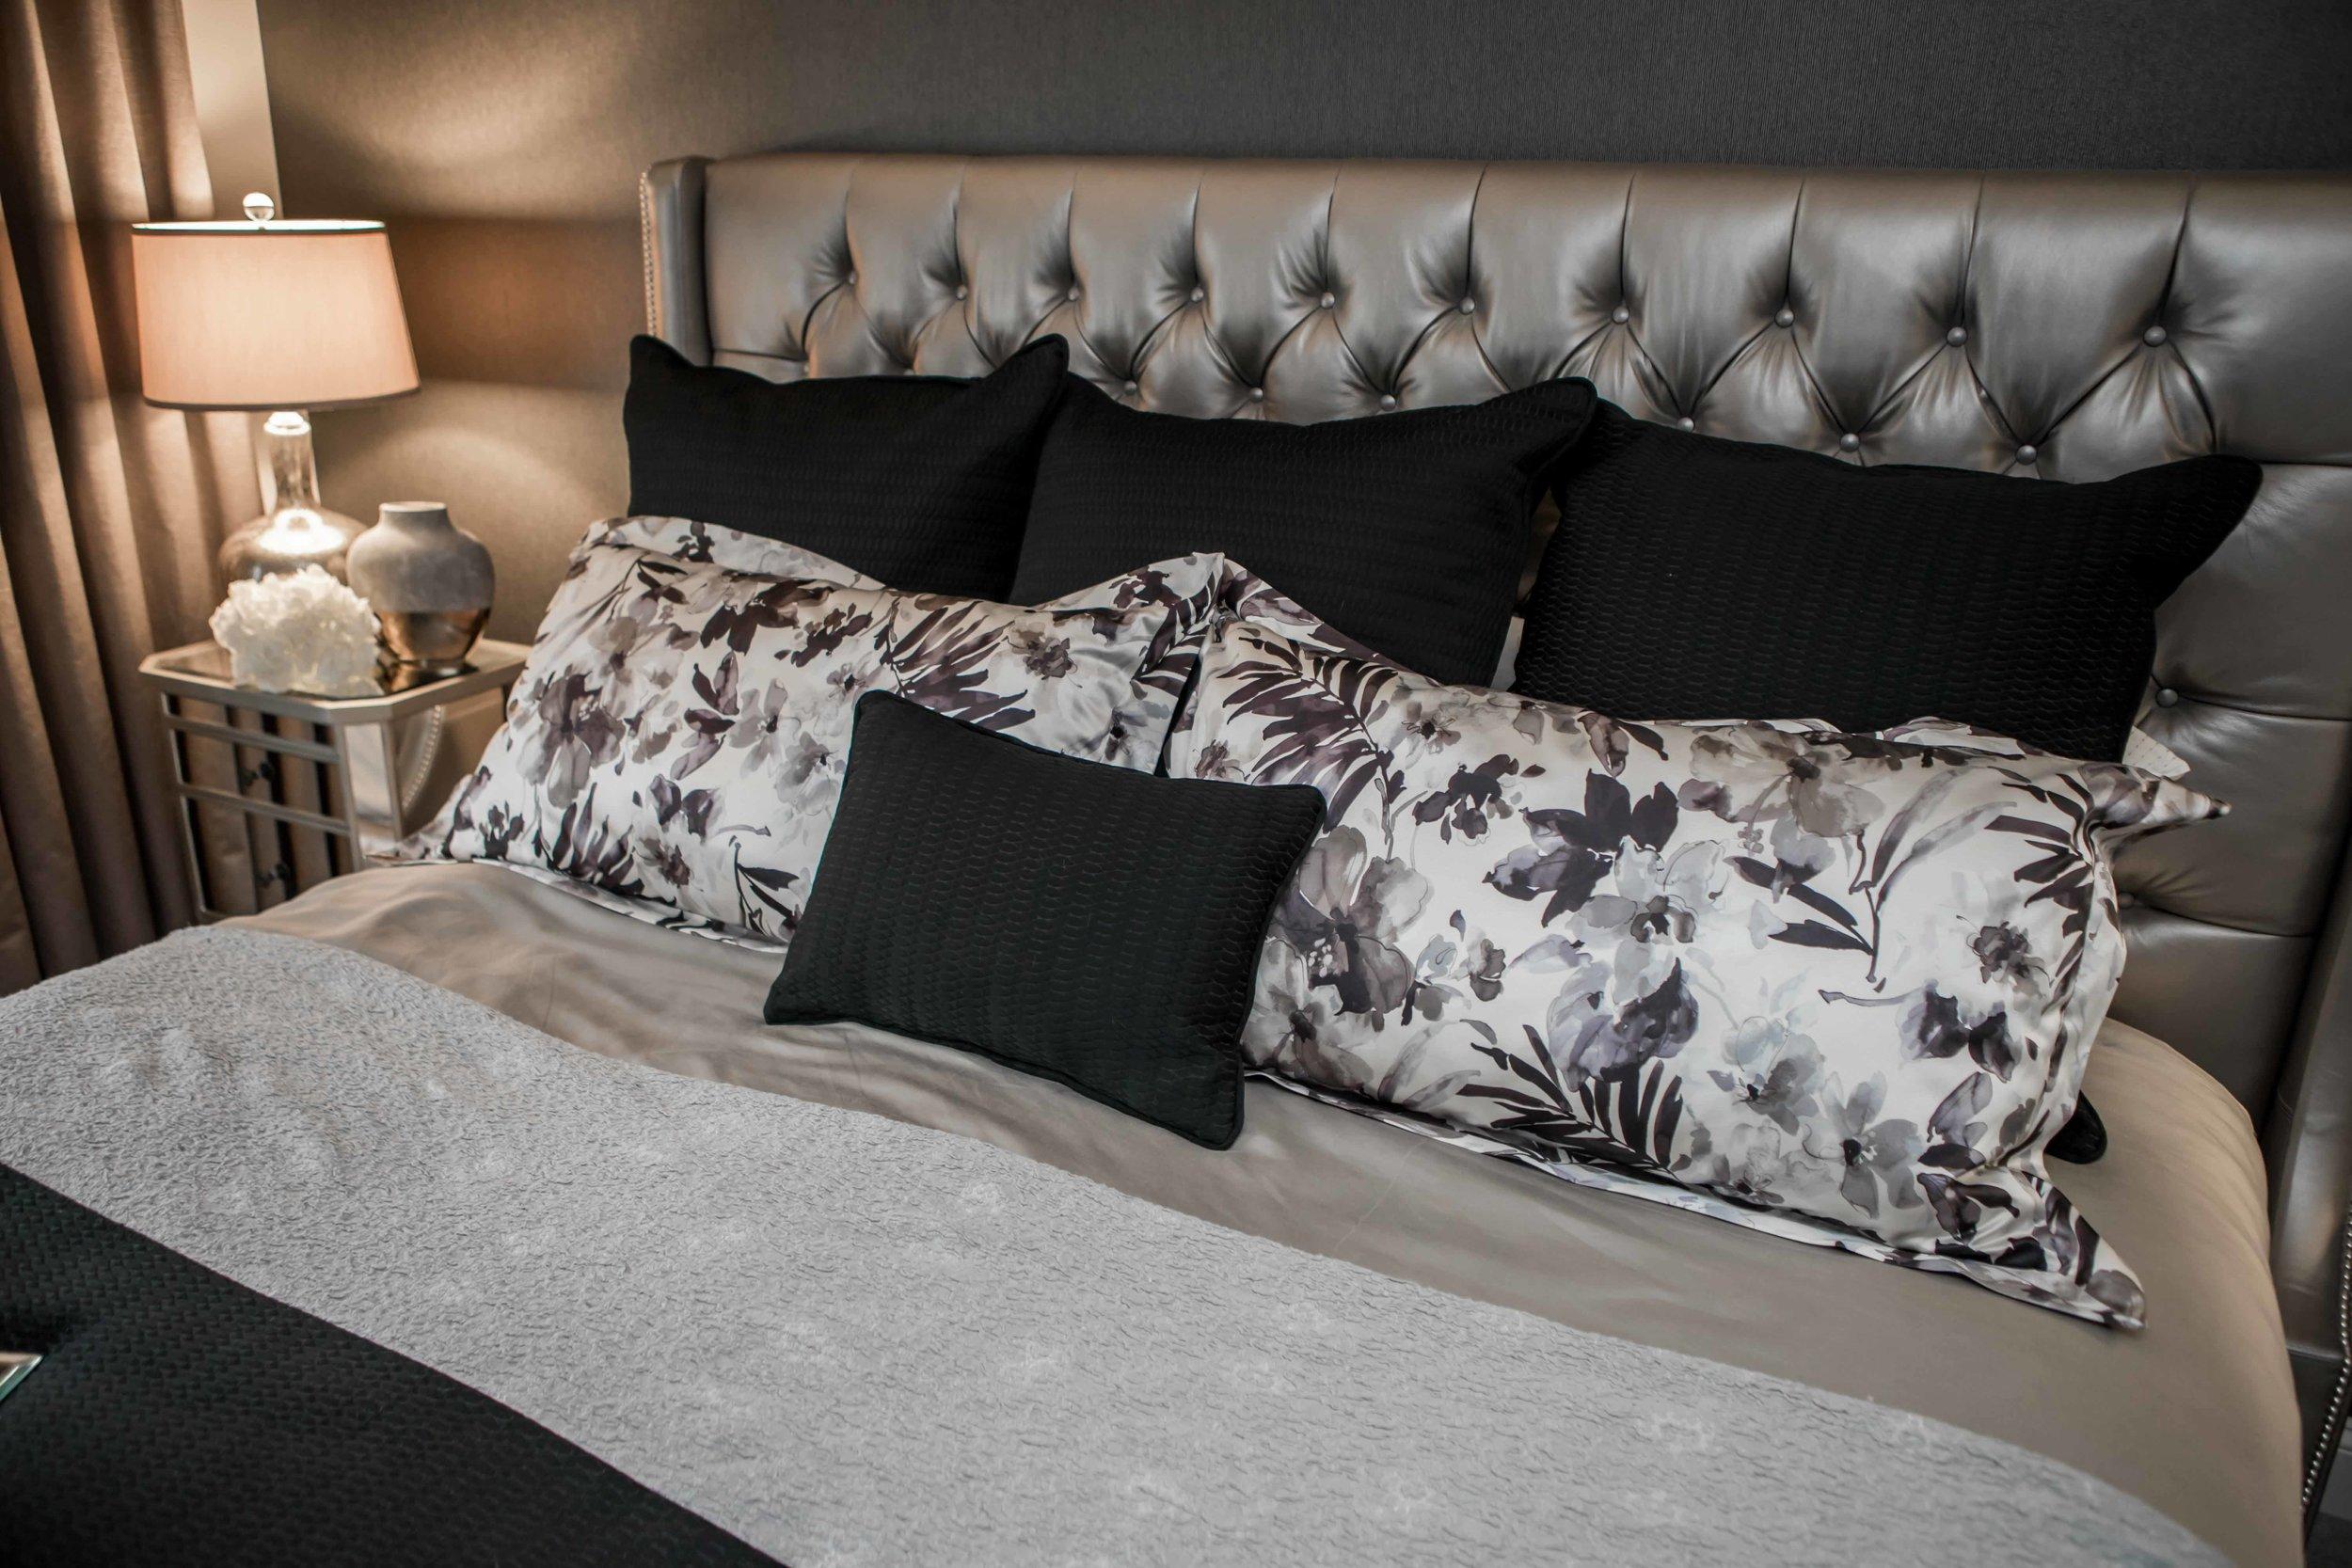 Picturesk-RL-Appelquist Bedrooms-24.jpg